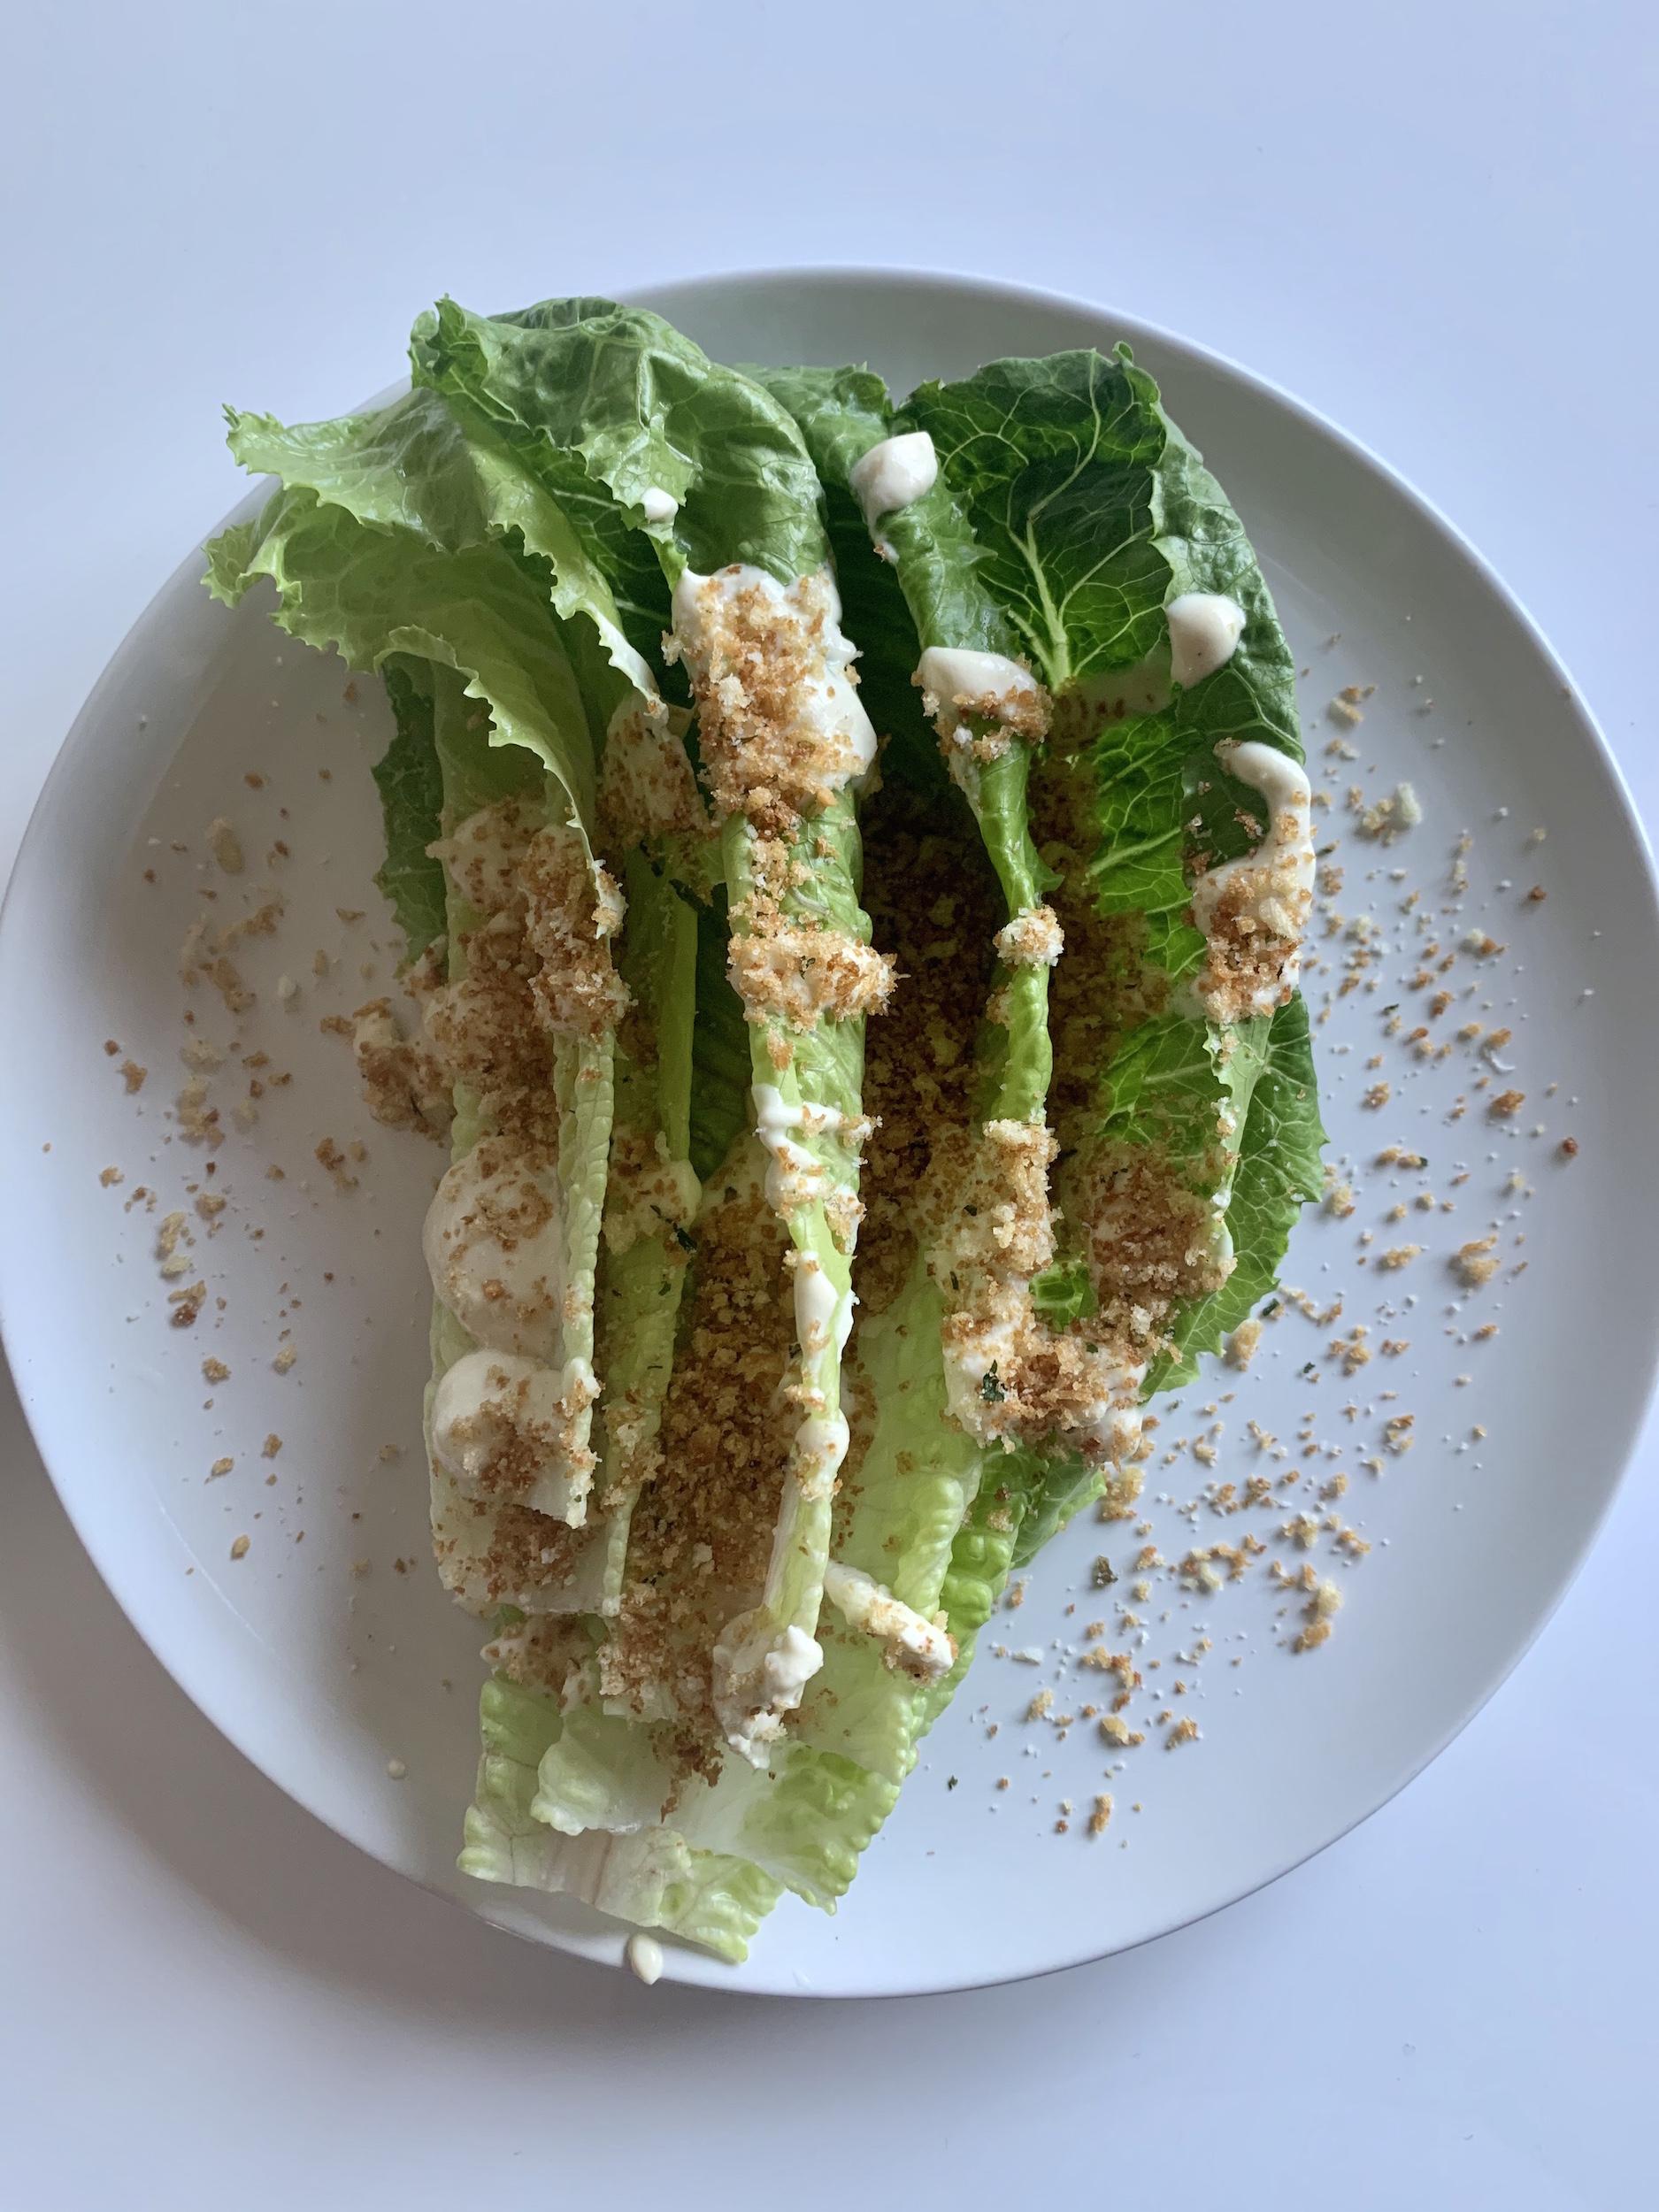 Greek Yogurt Caesar Salad with Parmesan Panko Crunch Topping